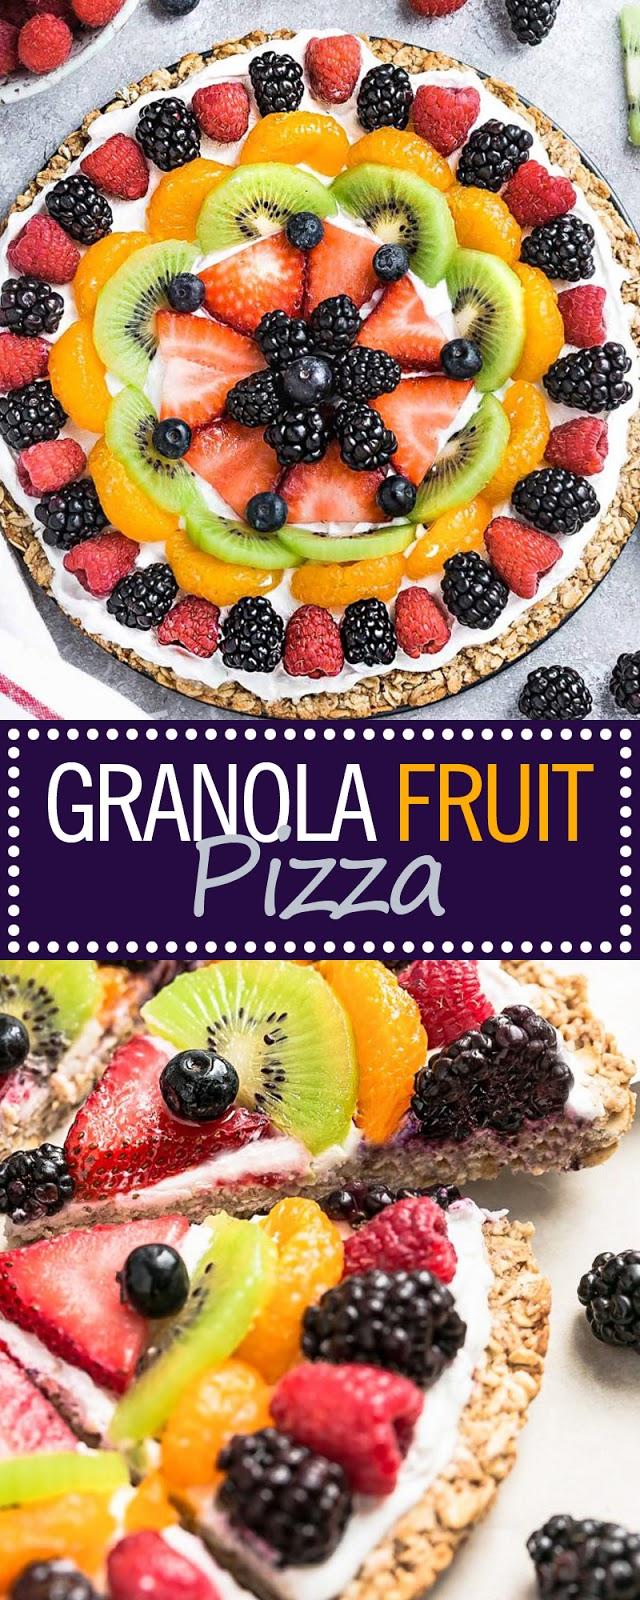 GRANOLA FRUIT PIZZA